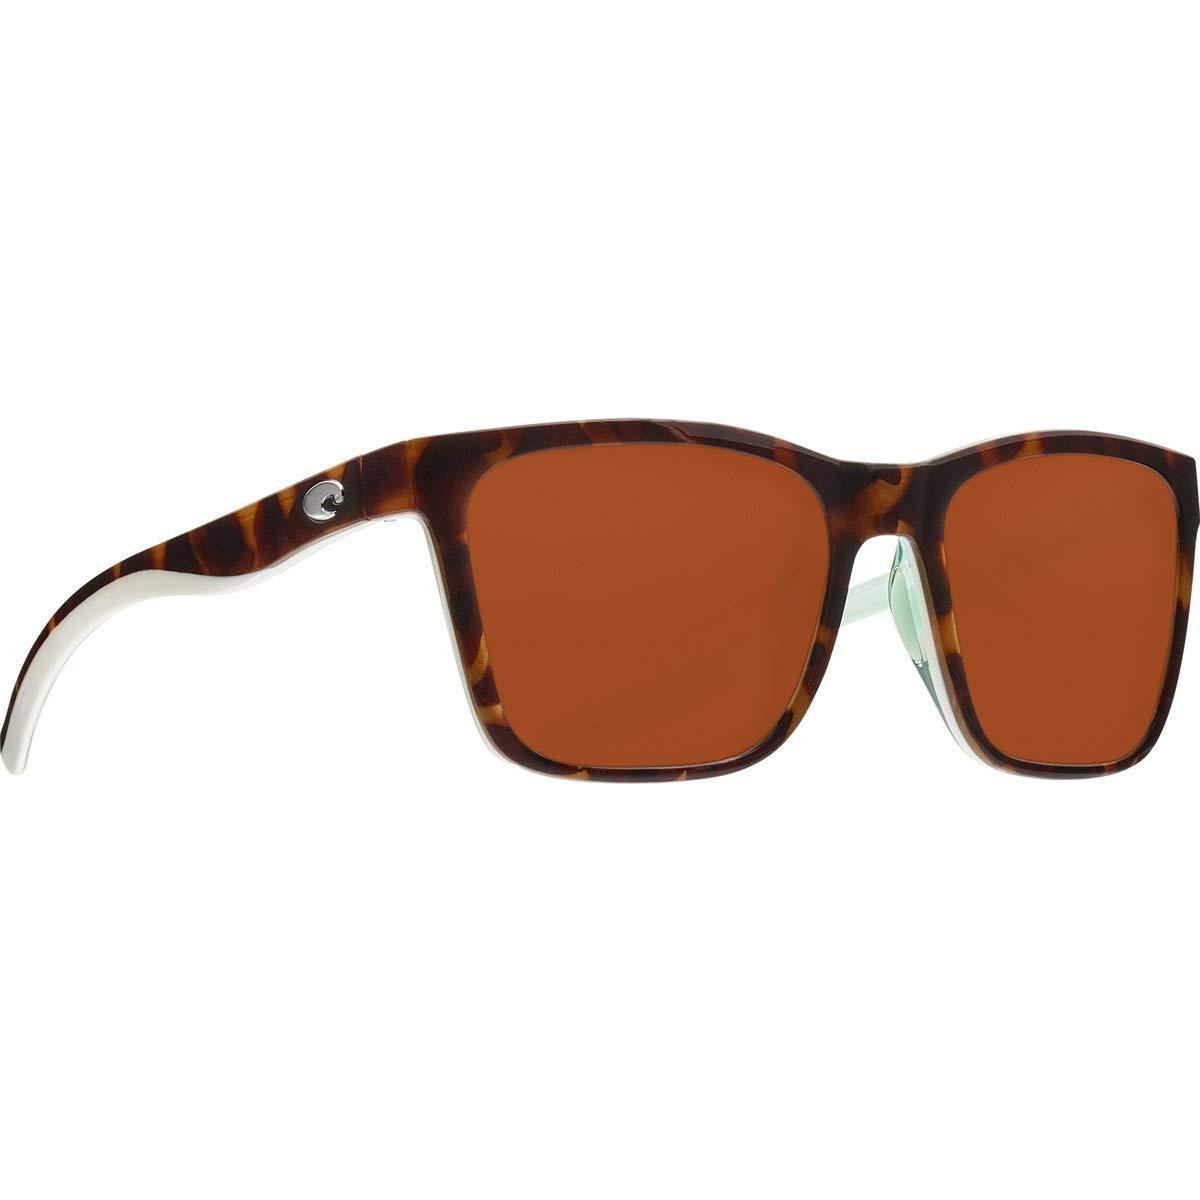 Costa Panga Multi-Color Plastic Frame Copper Lens Unisex Sunglasses PAG255OCP by Costa Del Mar